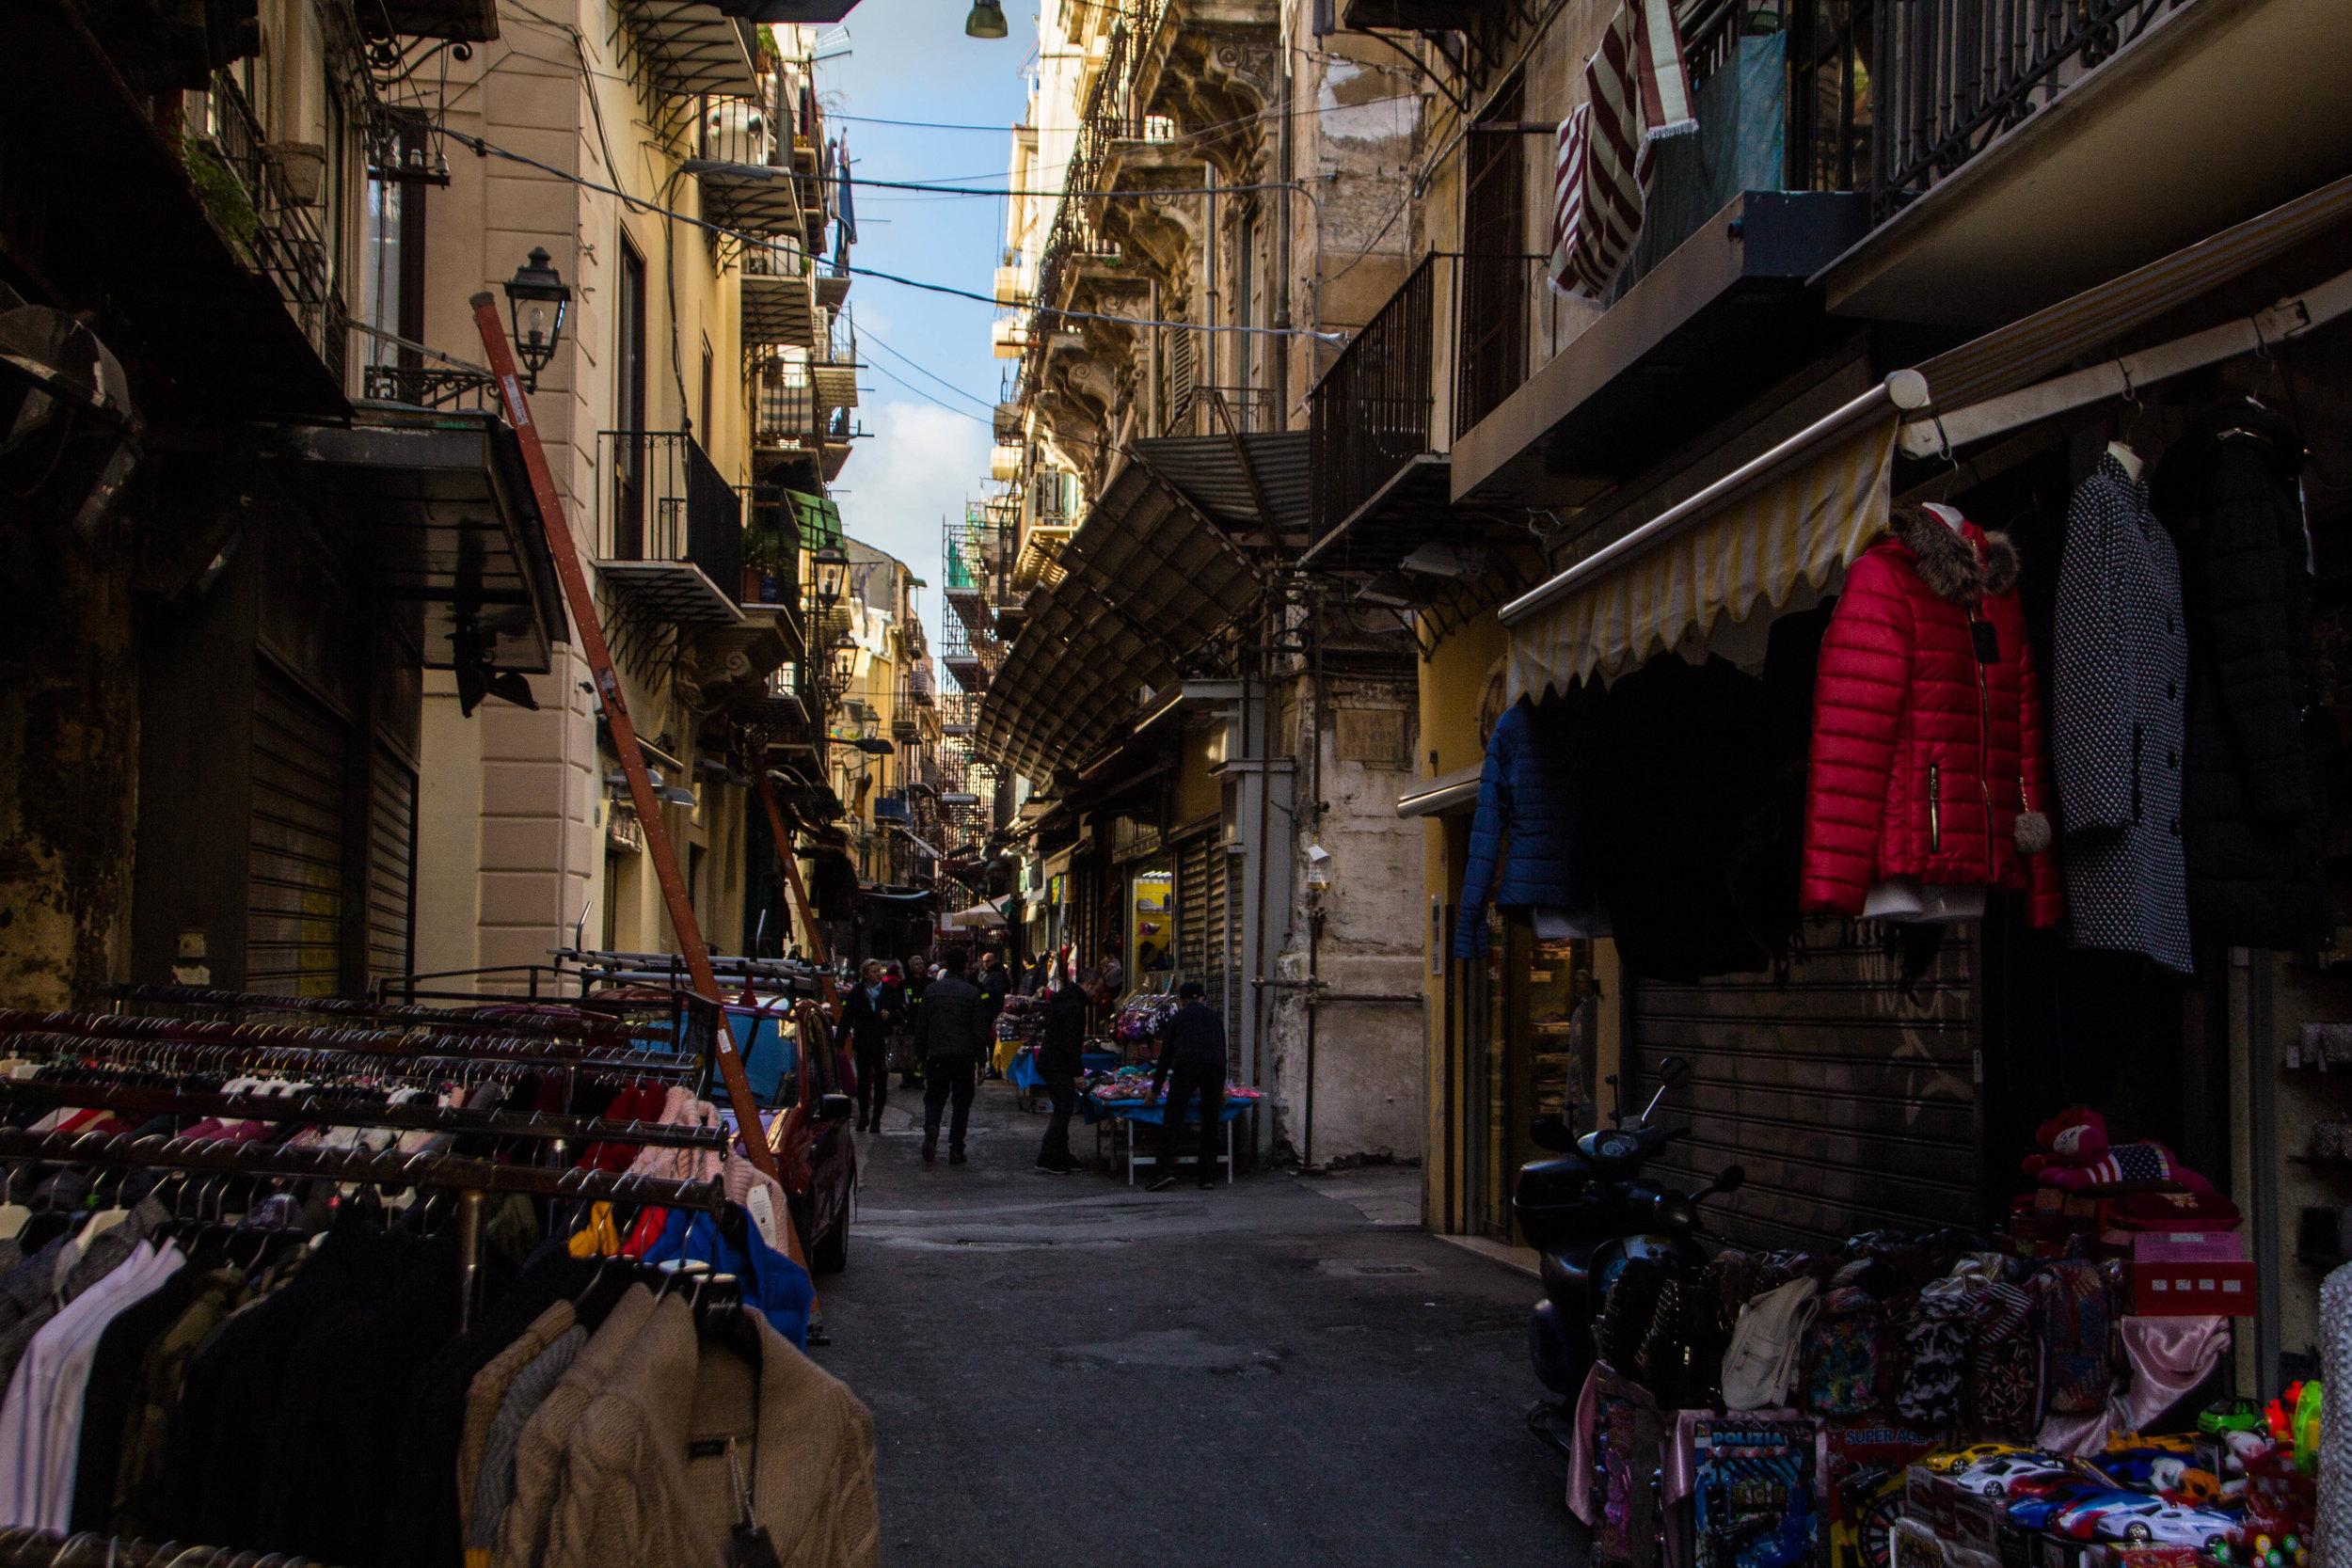 street-photography-palermo-sicily-55.jpg